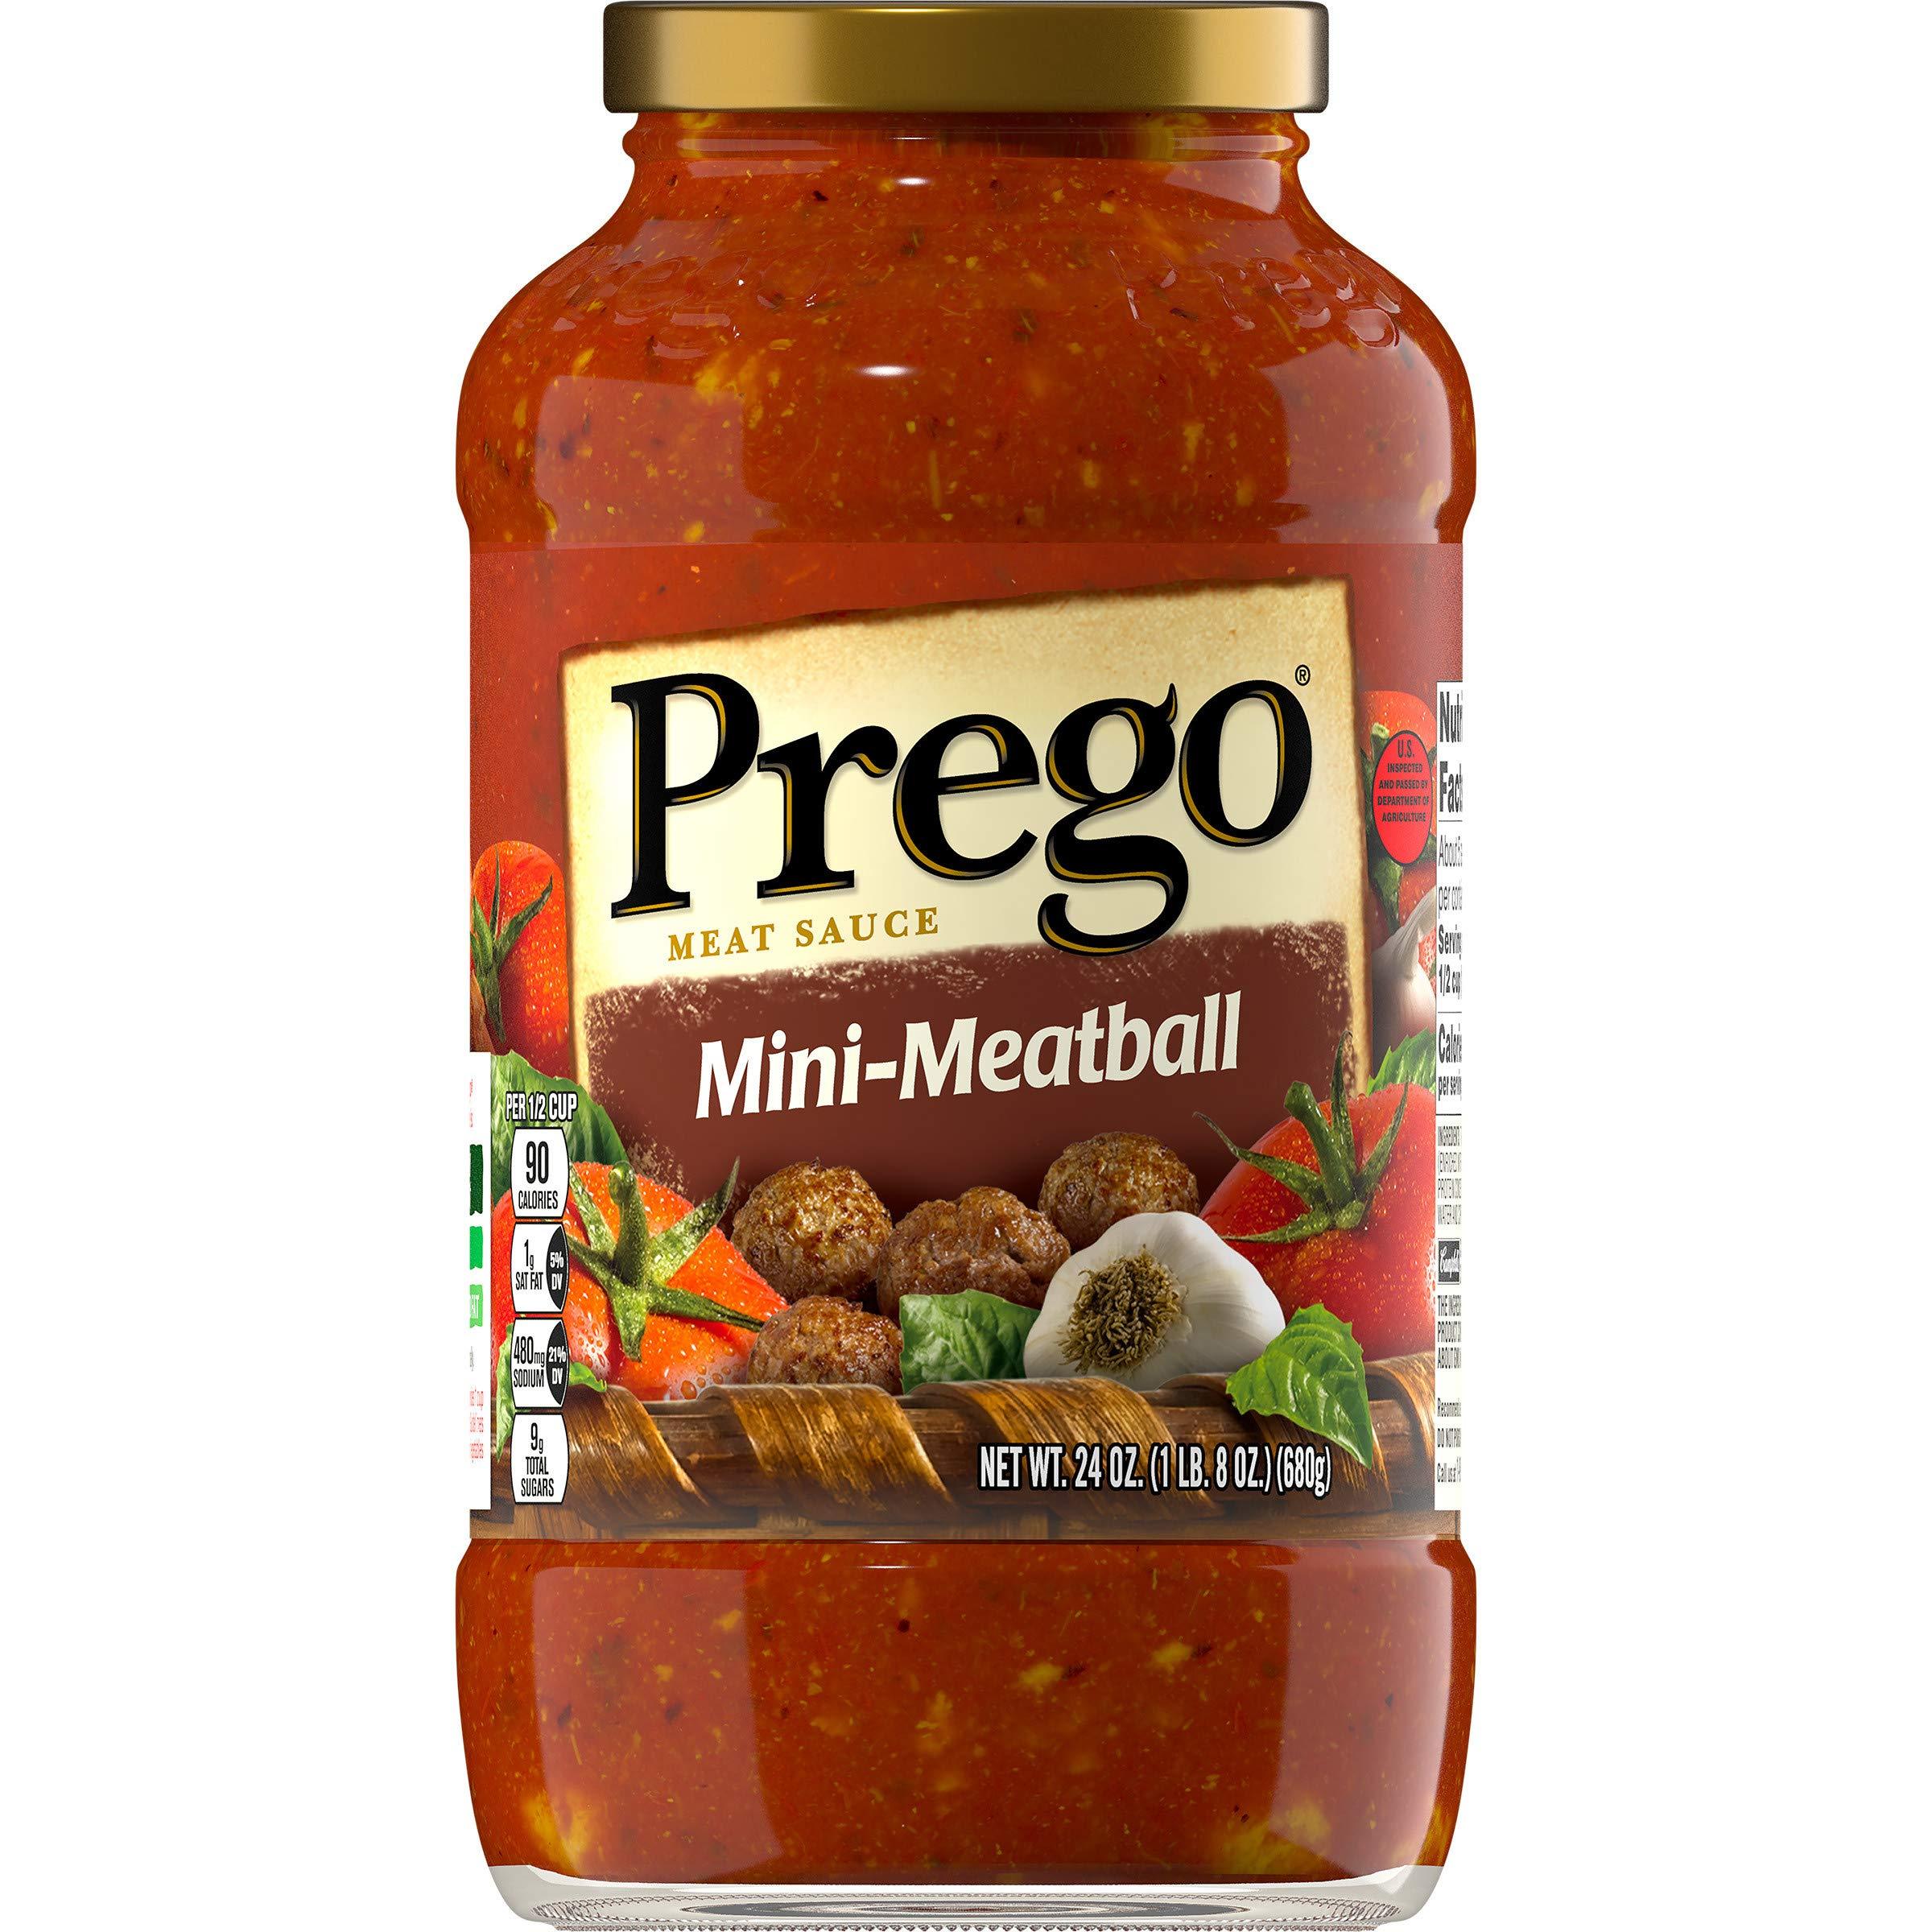 Prego Mini-Meatball Meat Sauce, 24 oz. by Prego